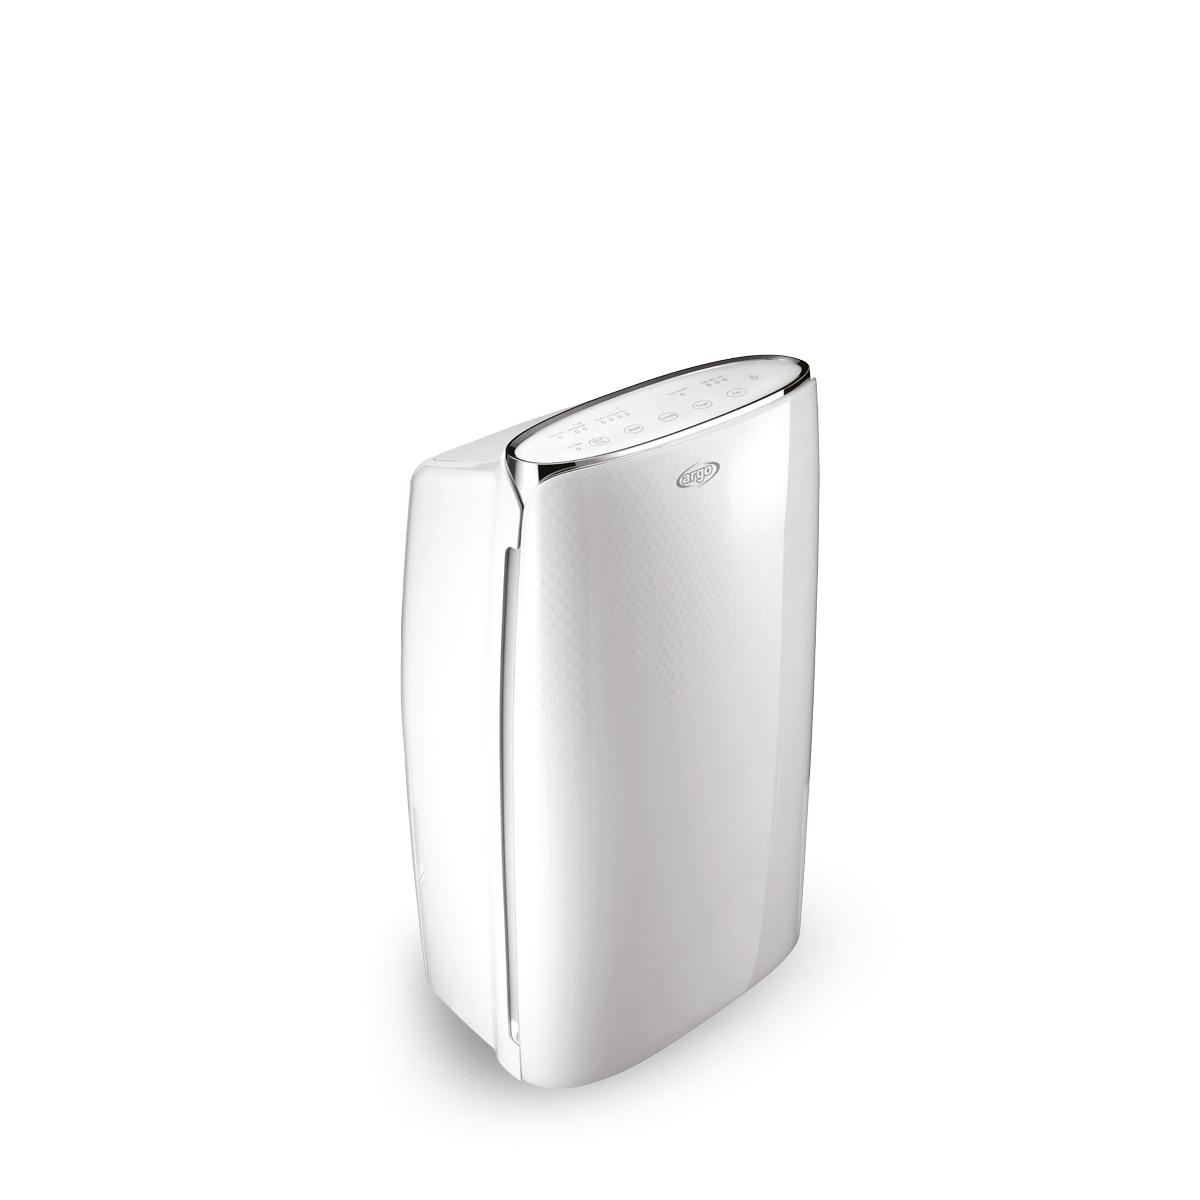 ARGO Platinum Evo 21 4 L 43 dB Platino 345 W